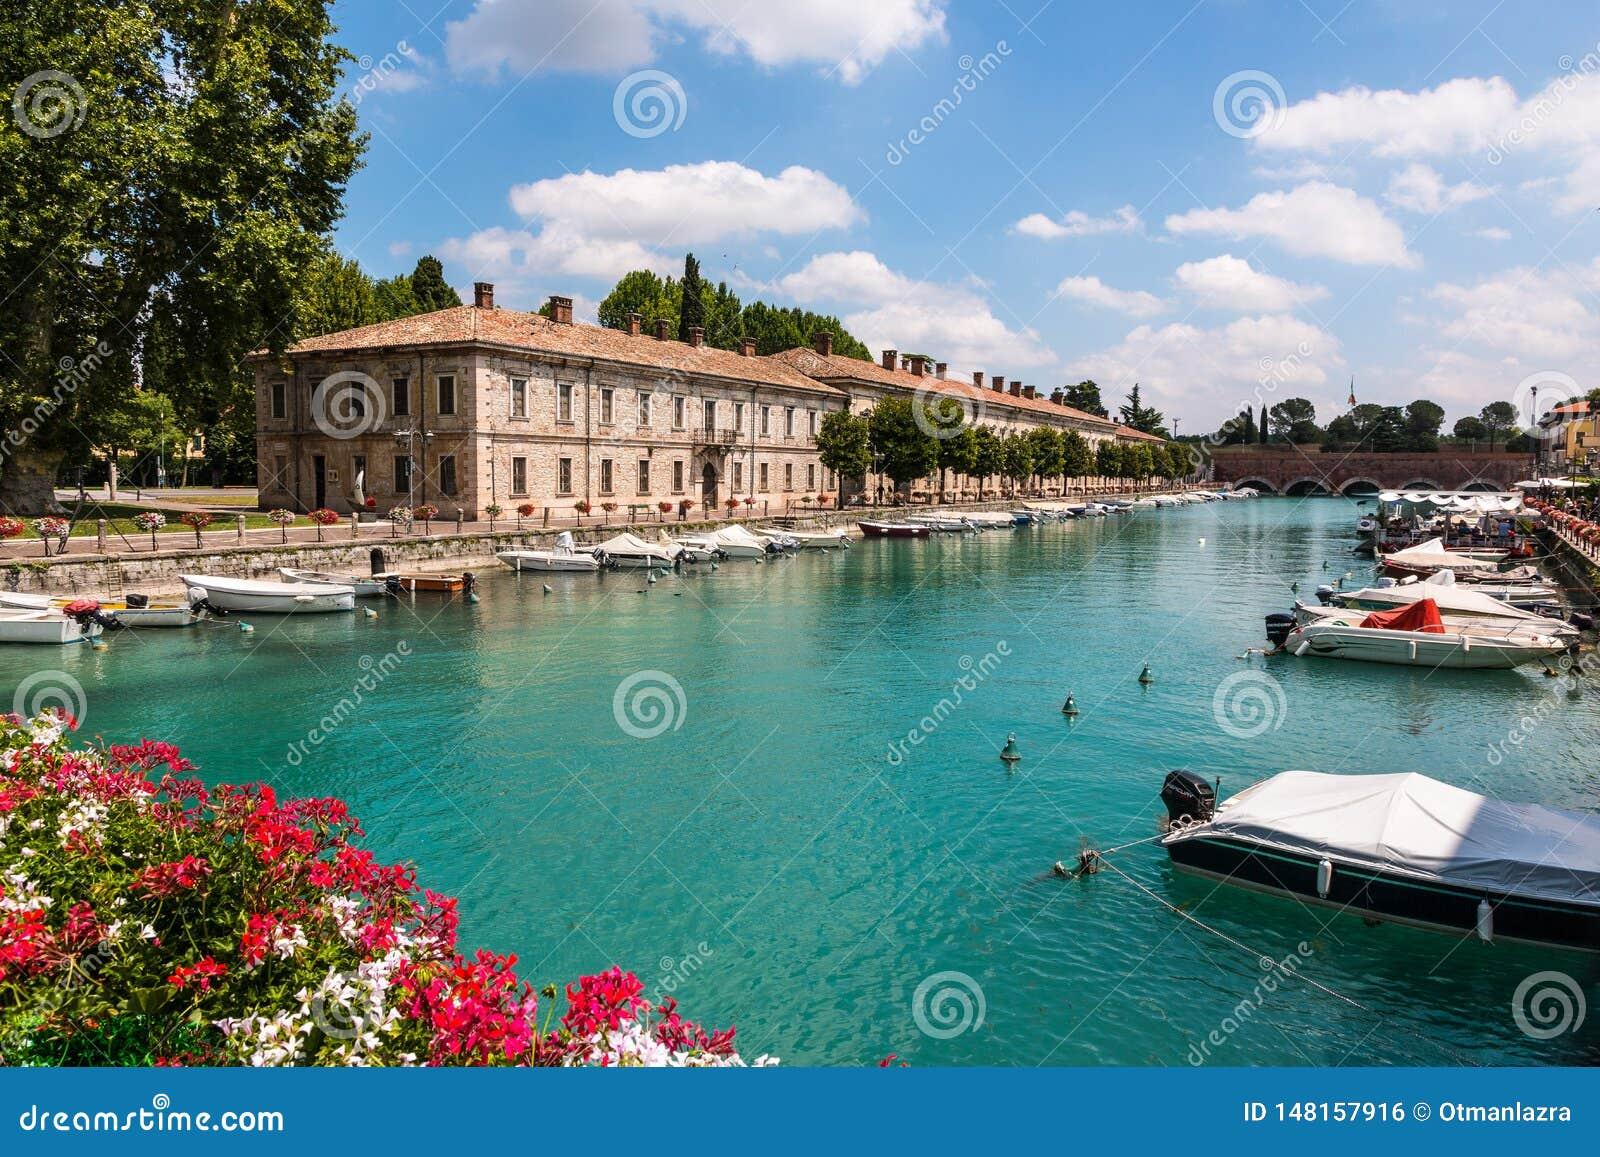 The beautiful historical harbor of Peschiera del Garda